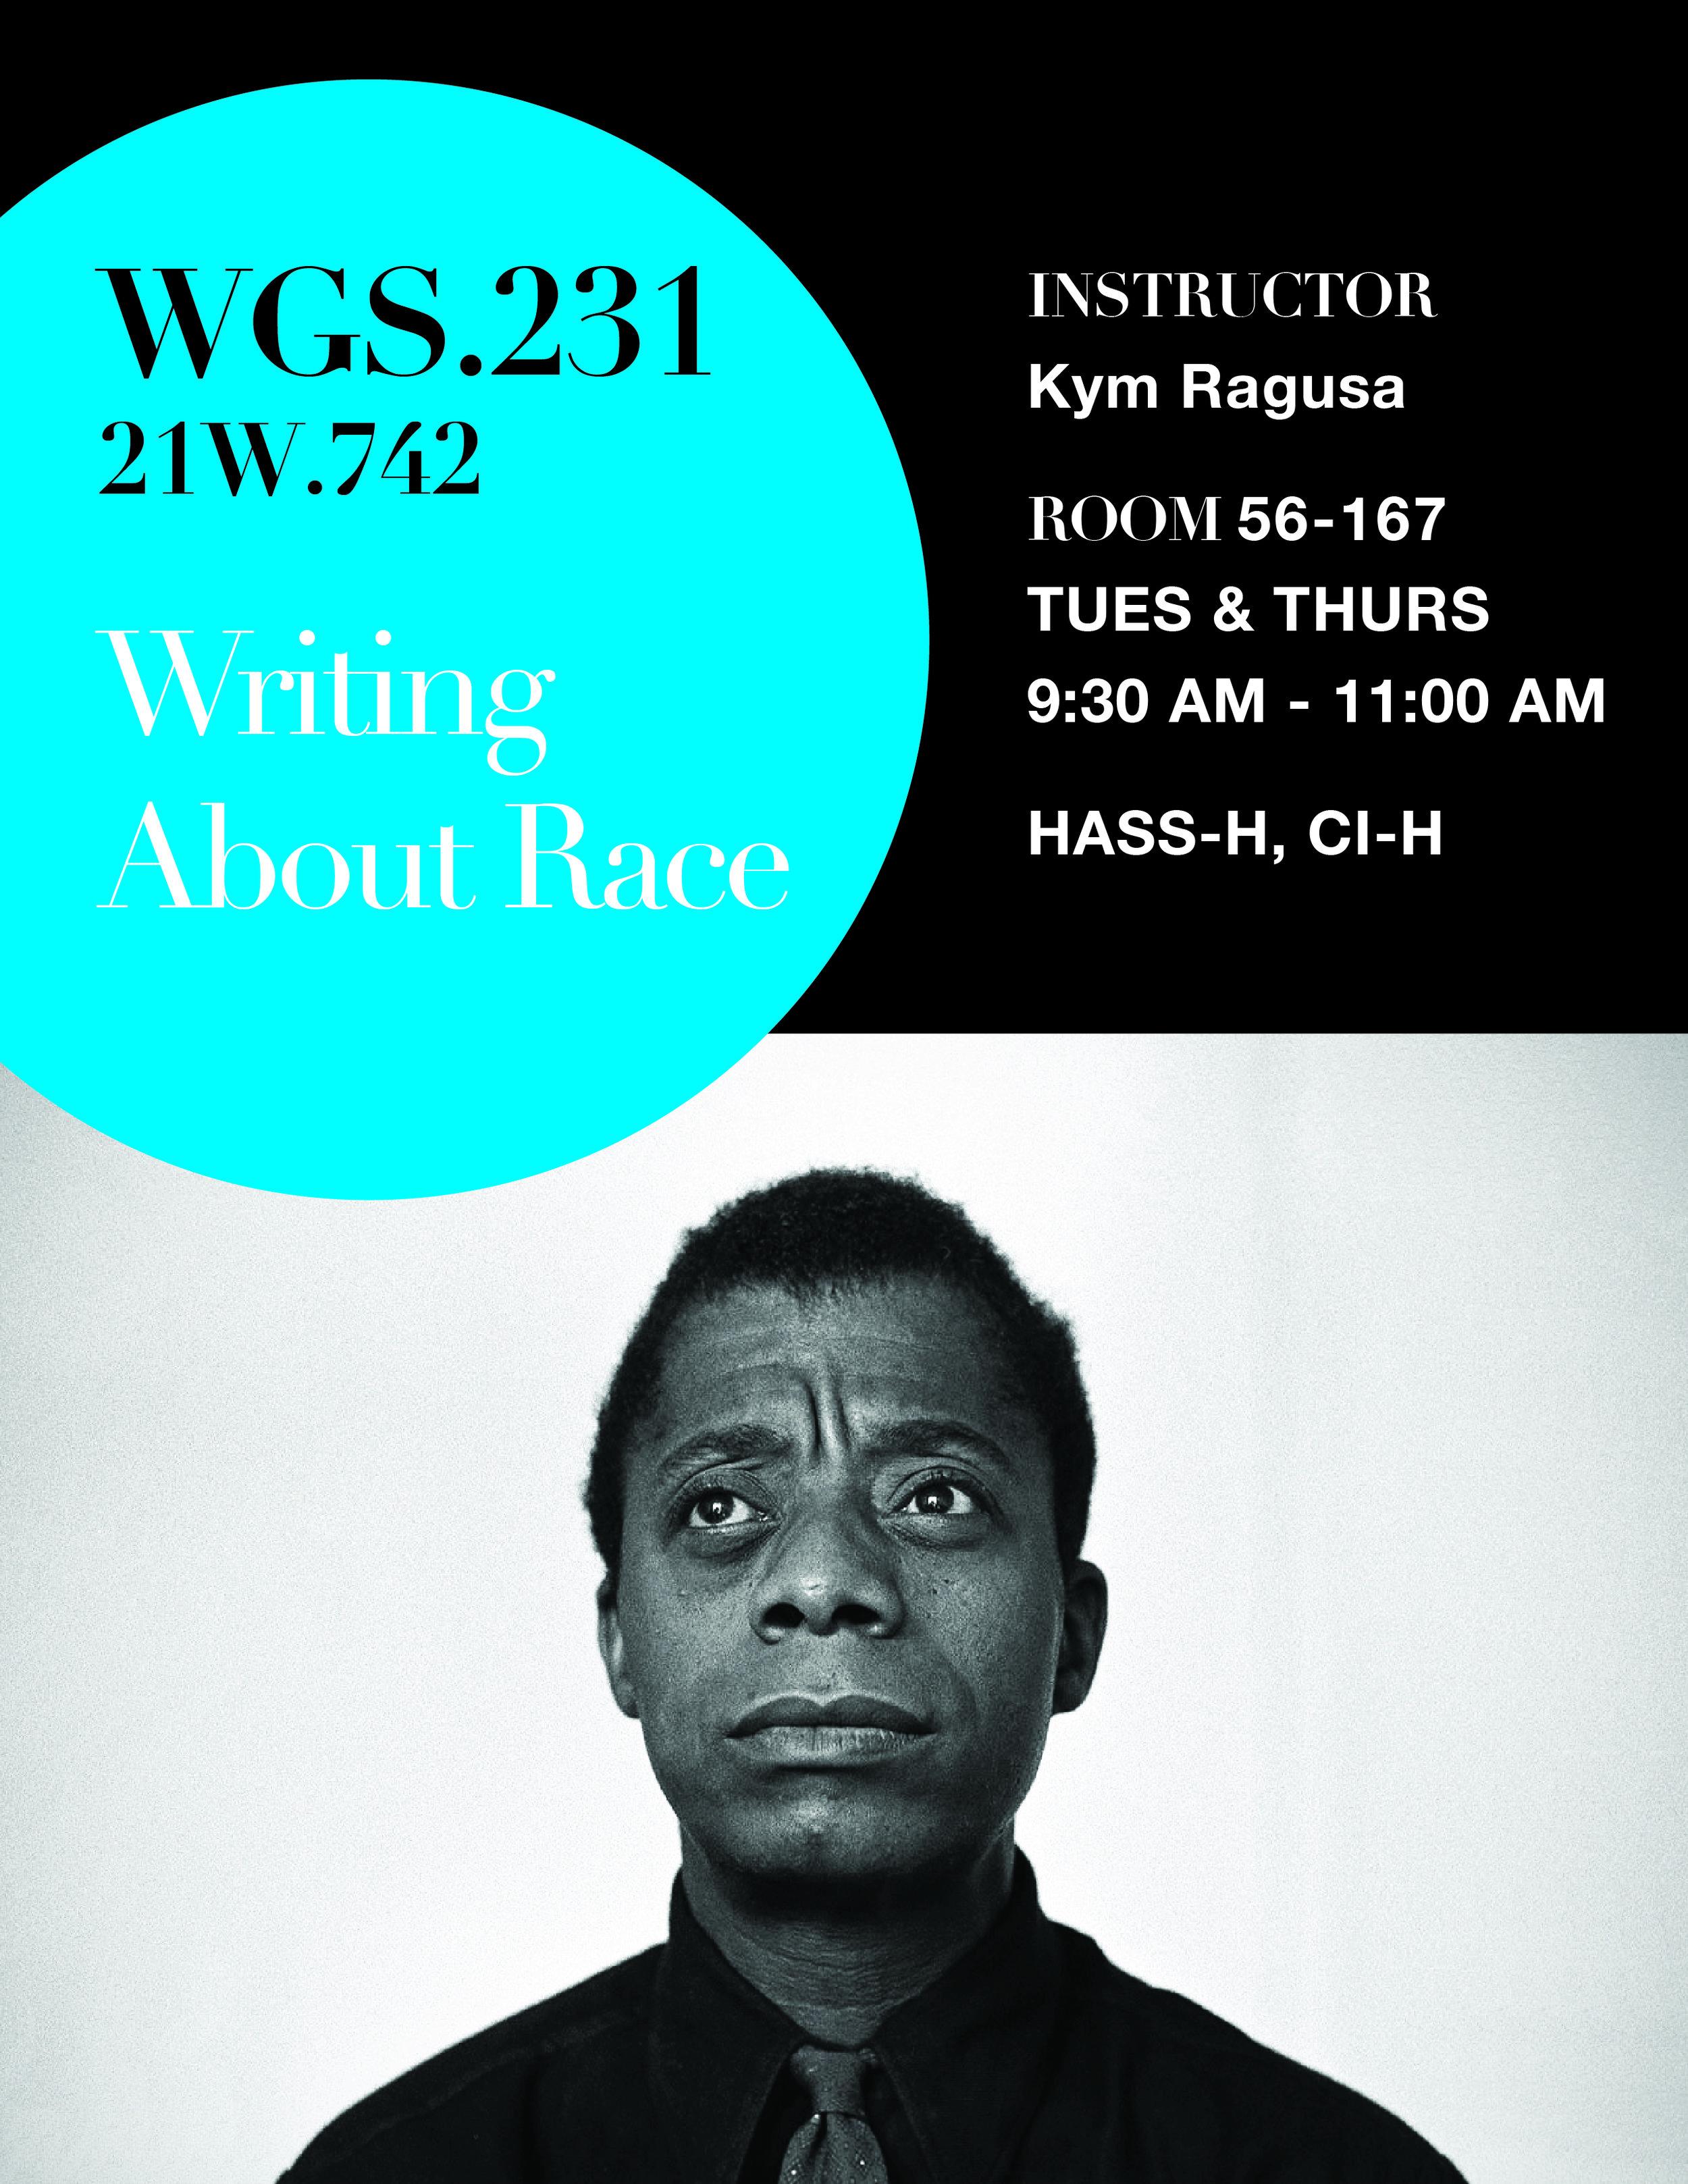 WGS231-WritingAboutRace-01.jpg